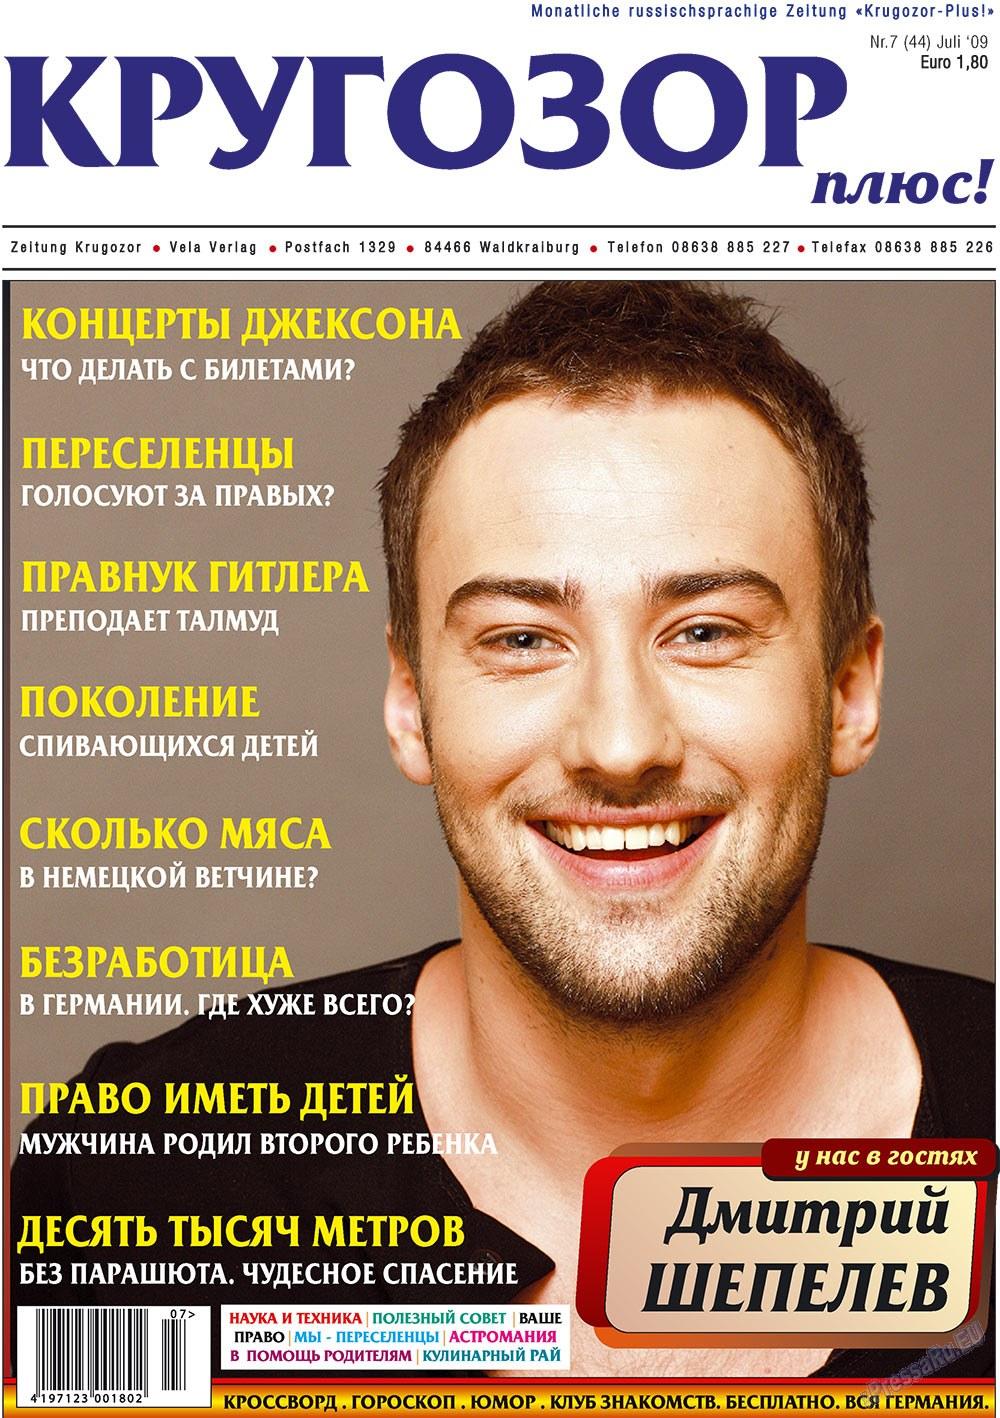 Кругозор плюс! (газета). 2009 год, номер 7, стр. 1